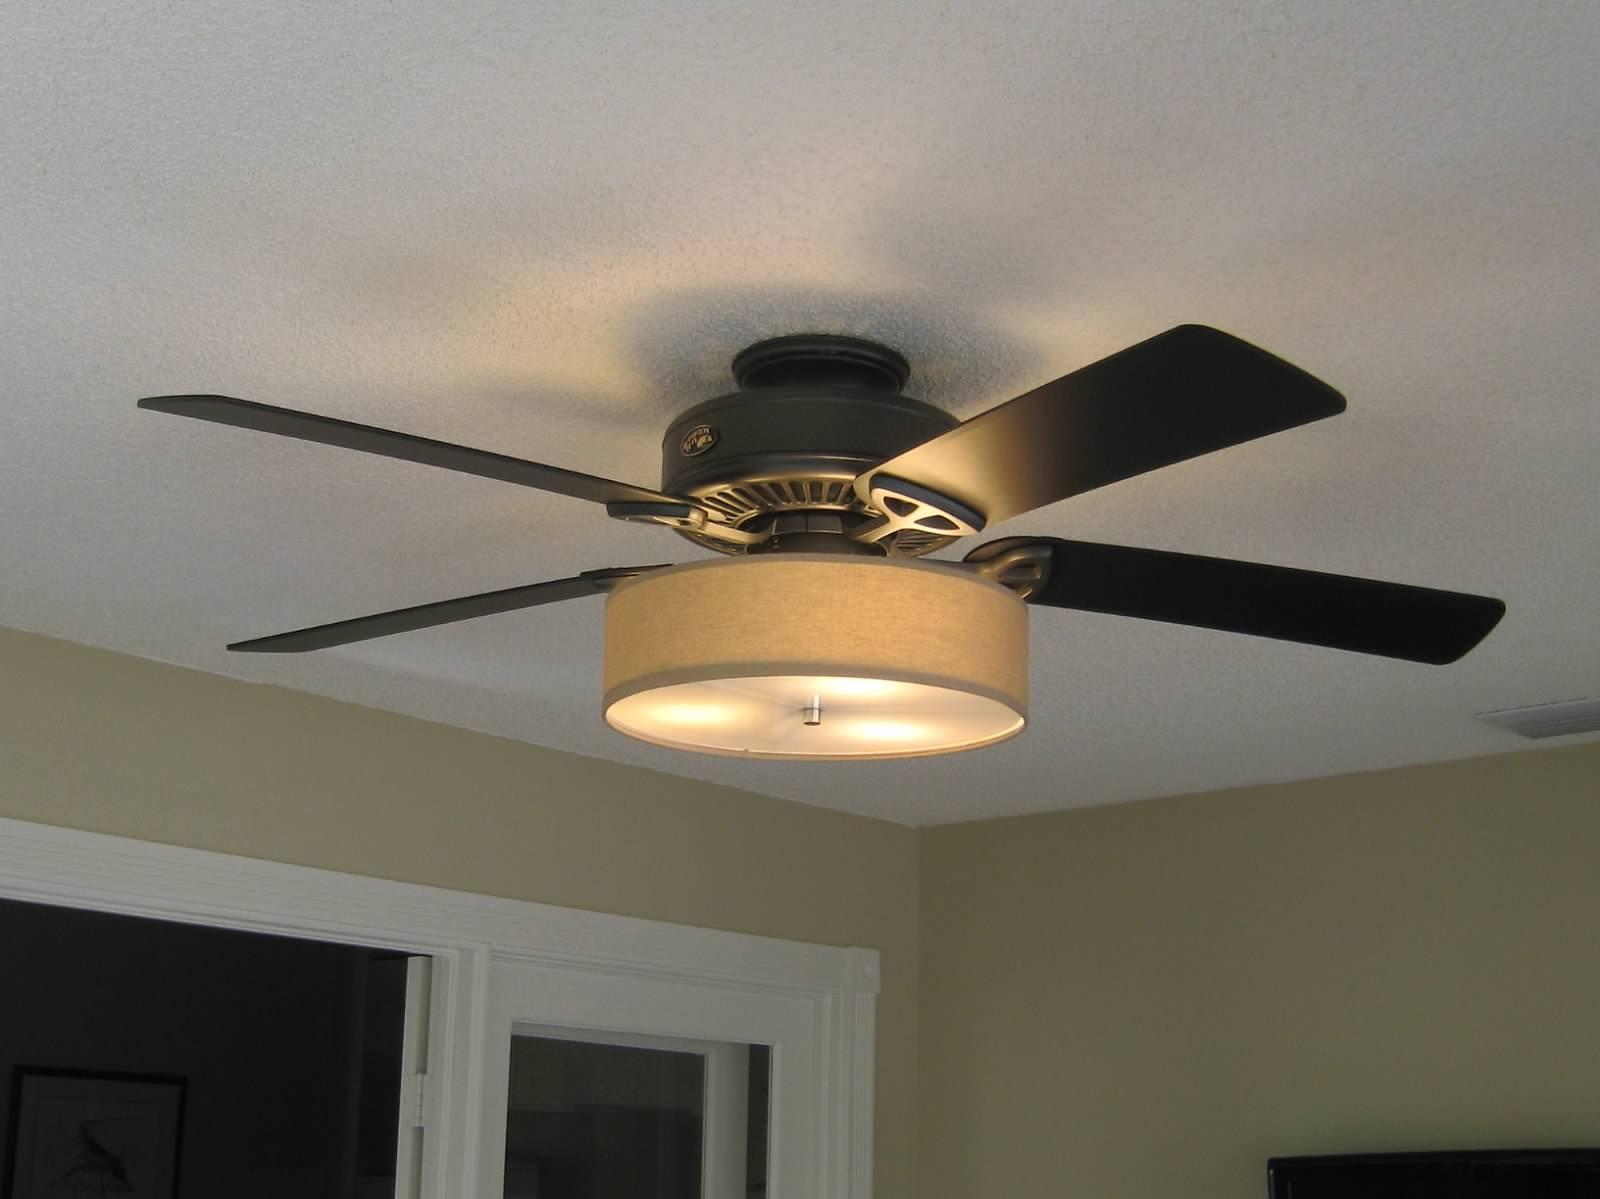 white ceiling fan light photo - 3